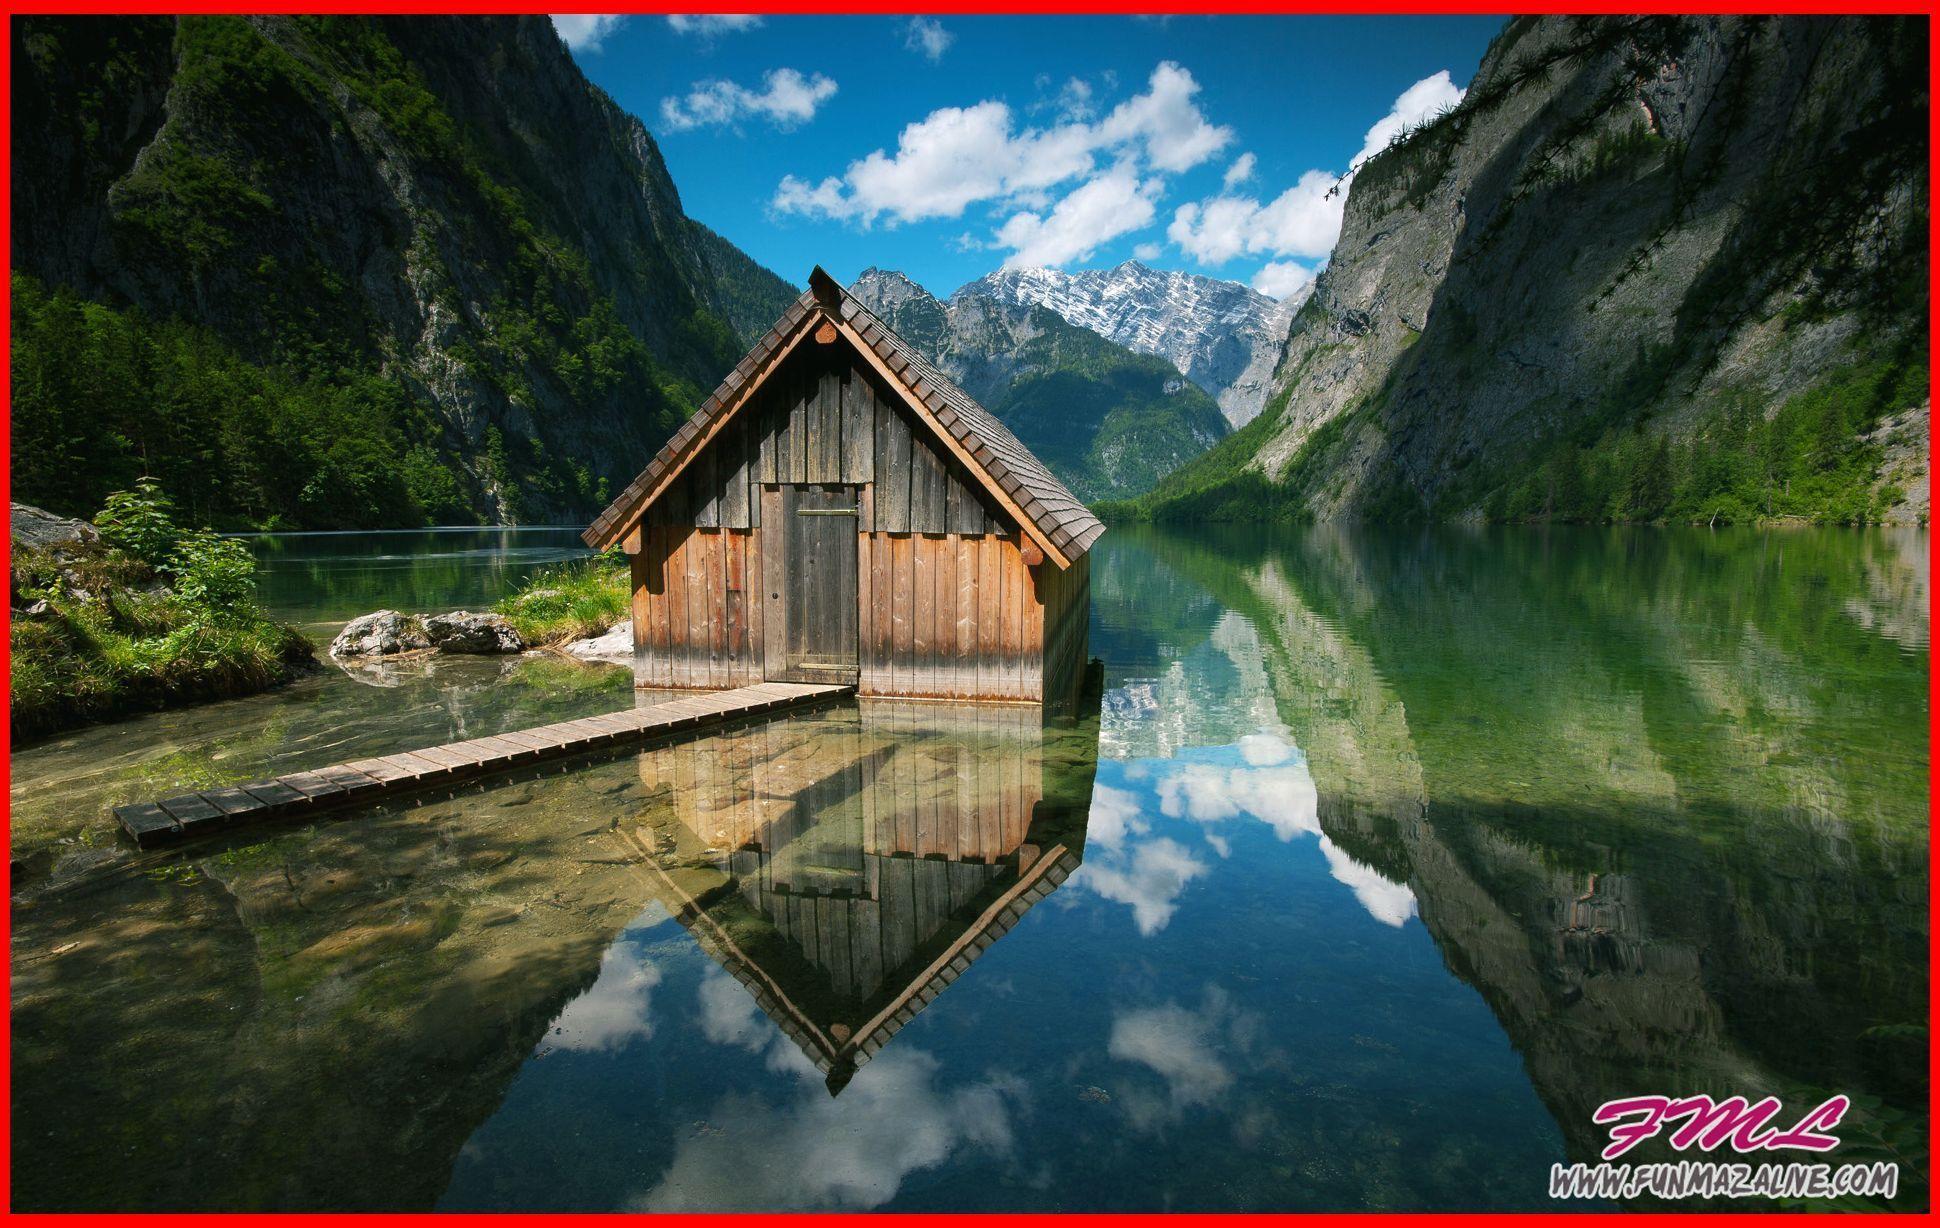 Wallpaper download nature beauty - Download Beautiful Nature Desktop Wallpaper